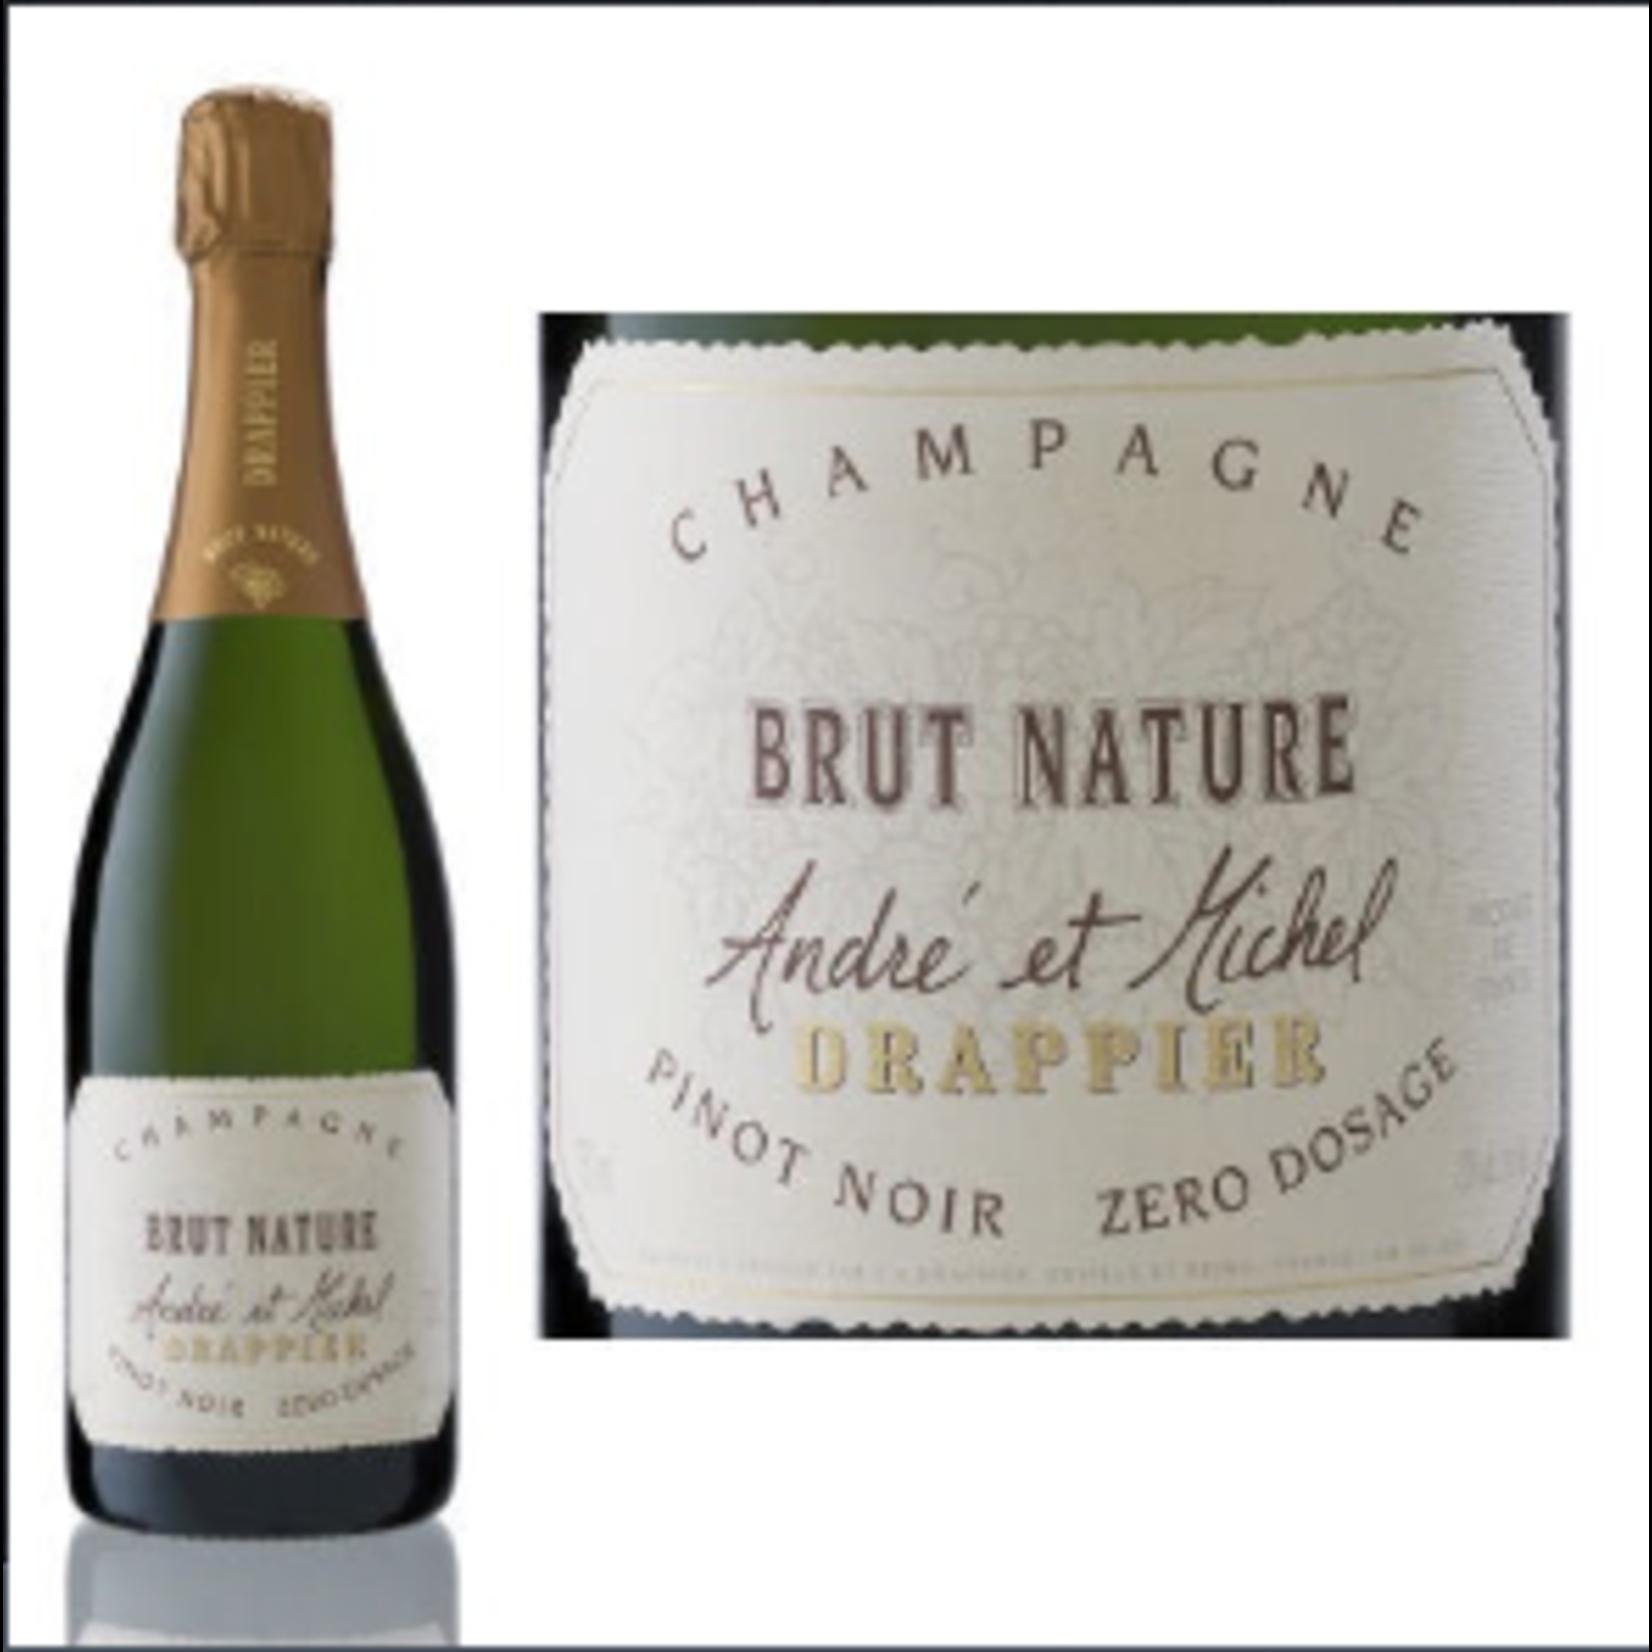 Drappier Drappier Brut Nature Zero Dosage  Non-Vintage  Champagne, France  92pts-WS, 91pts-WE, 91pts-JS